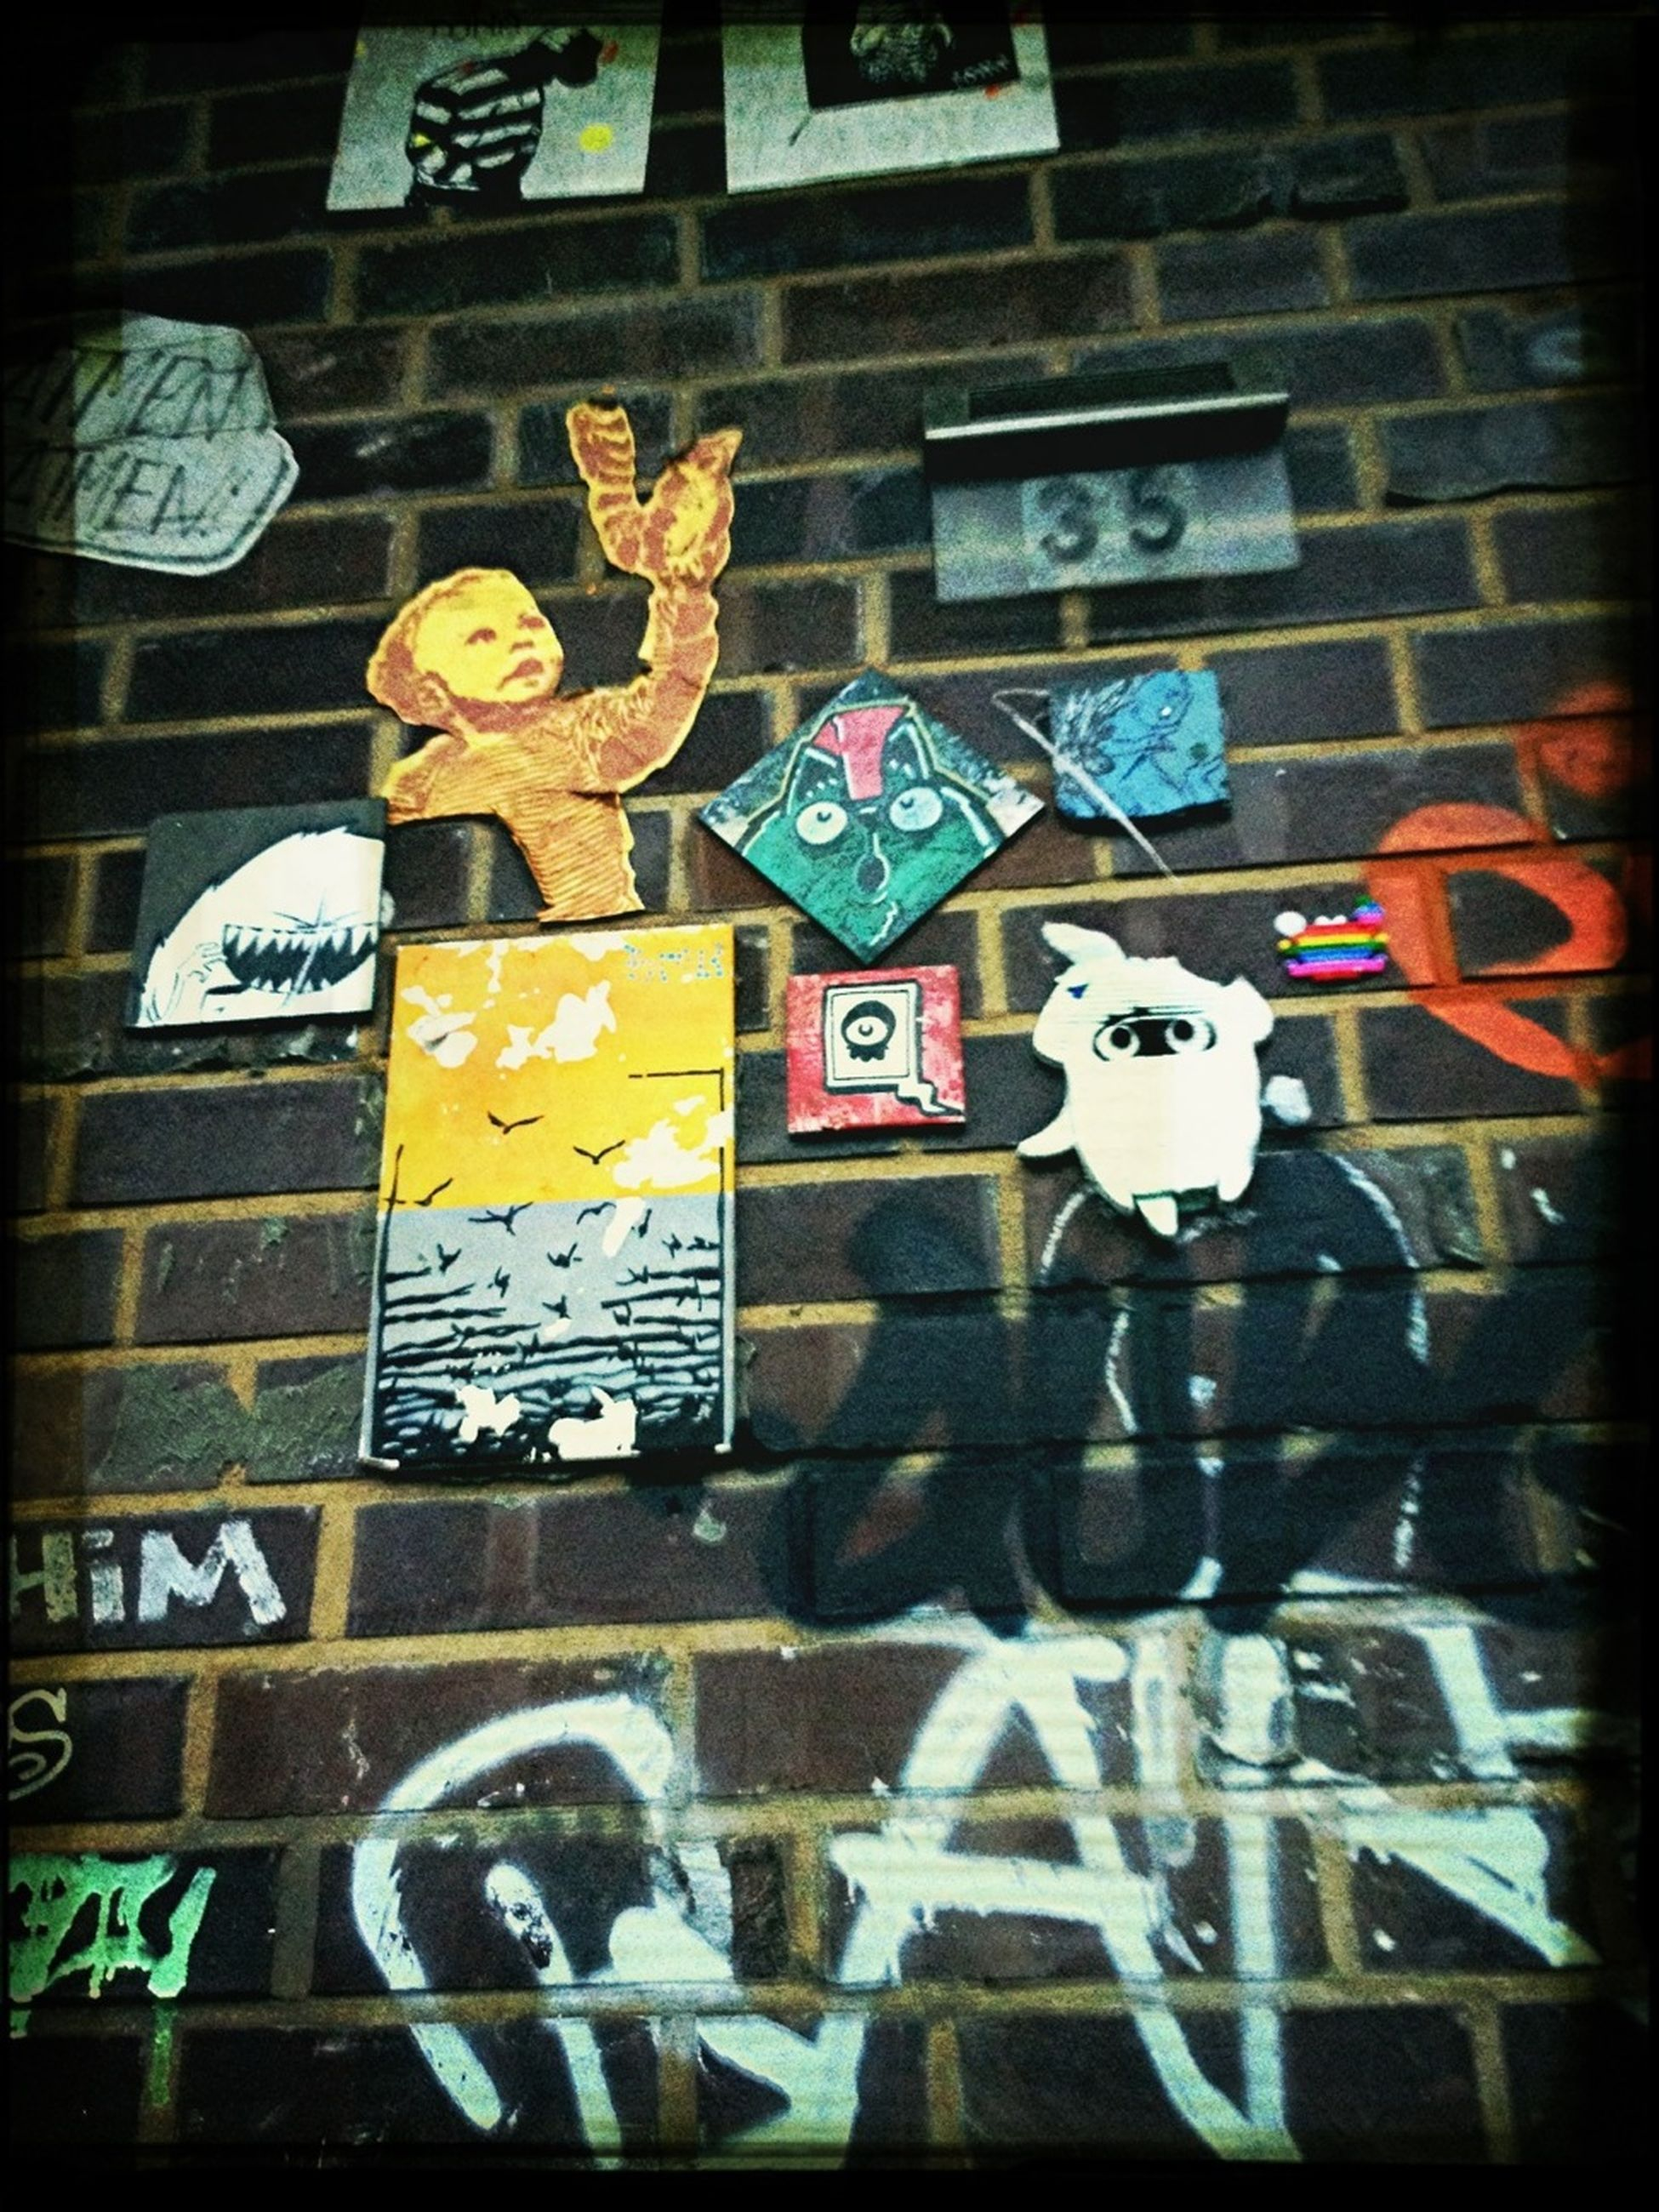 graffiti, text, western script, art, art and craft, communication, creativity, built structure, human representation, architecture, wall - building feature, transfer print, building exterior, street art, auto post production filter, non-western script, vandalism, capital letter, sign